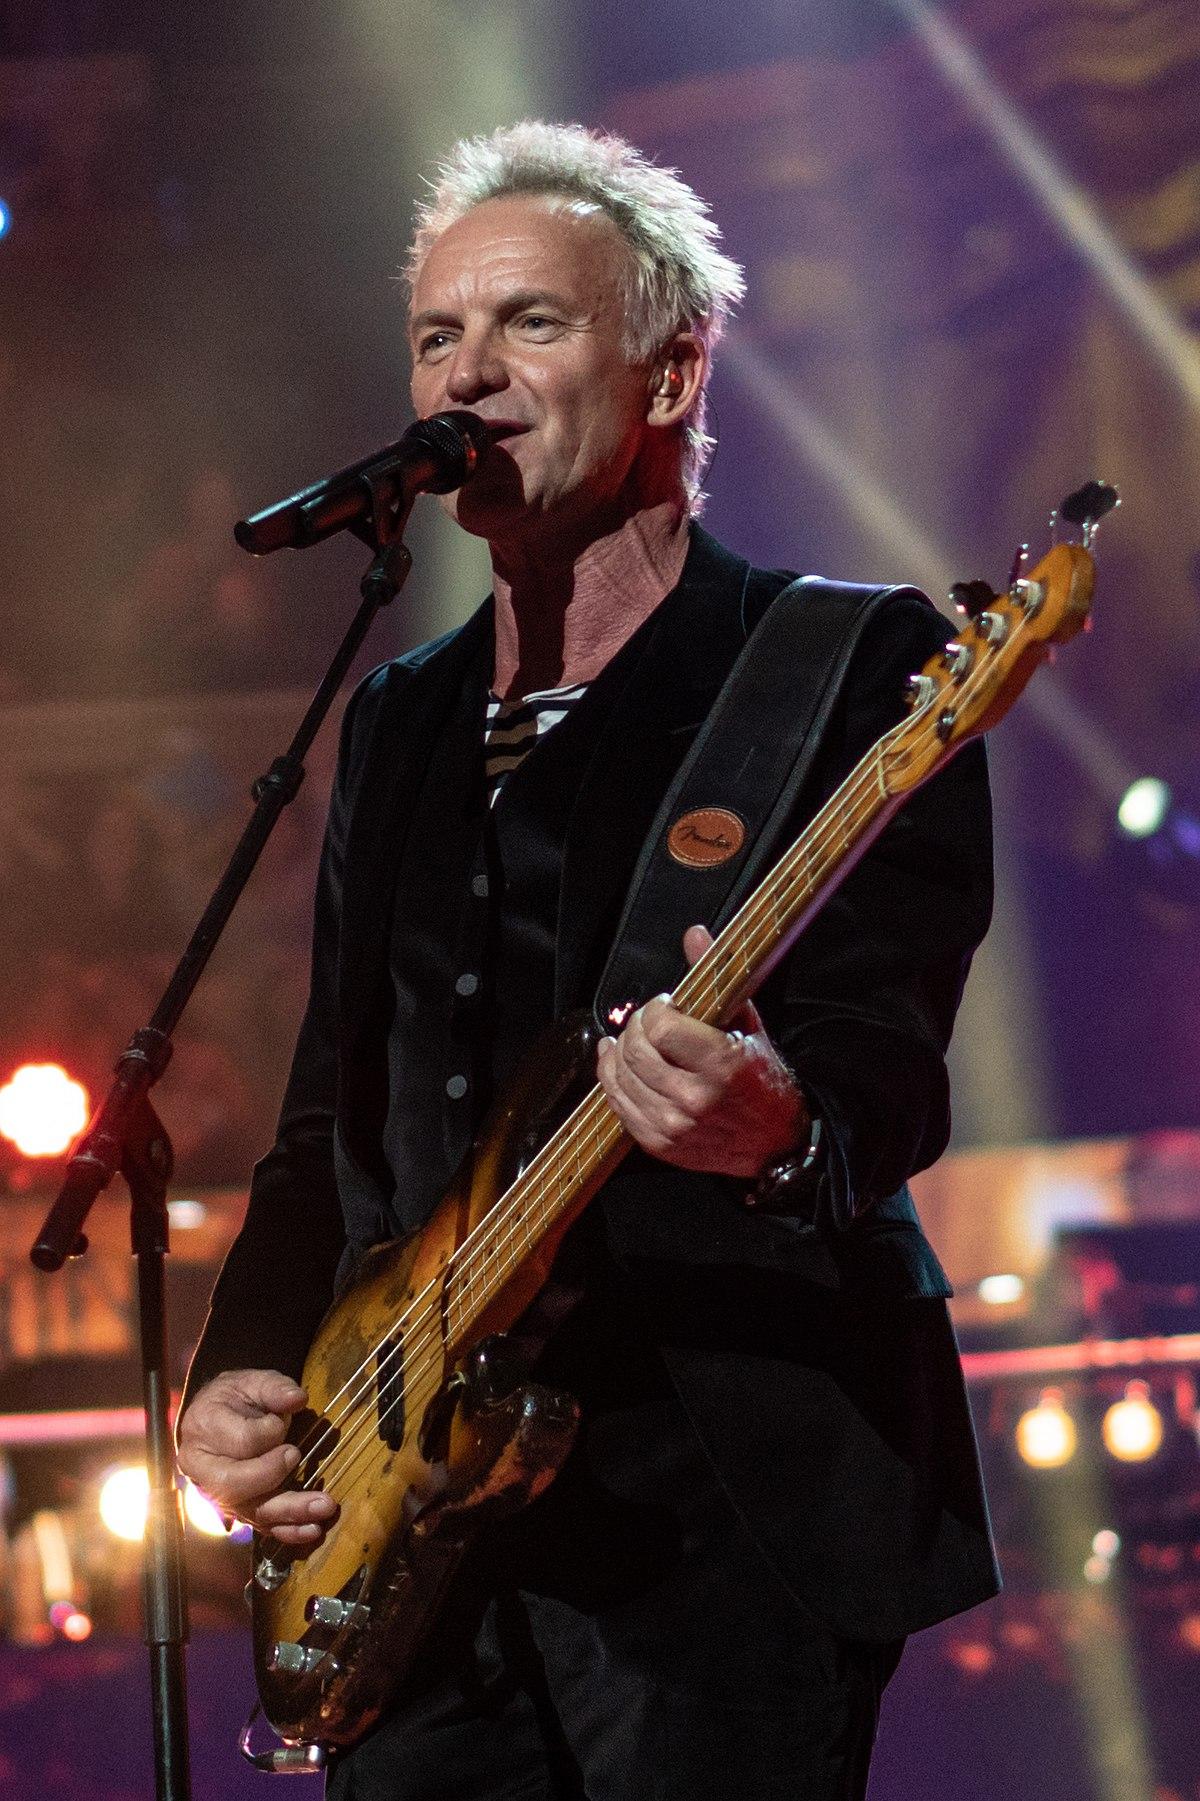 Sting (musician) - Wik...